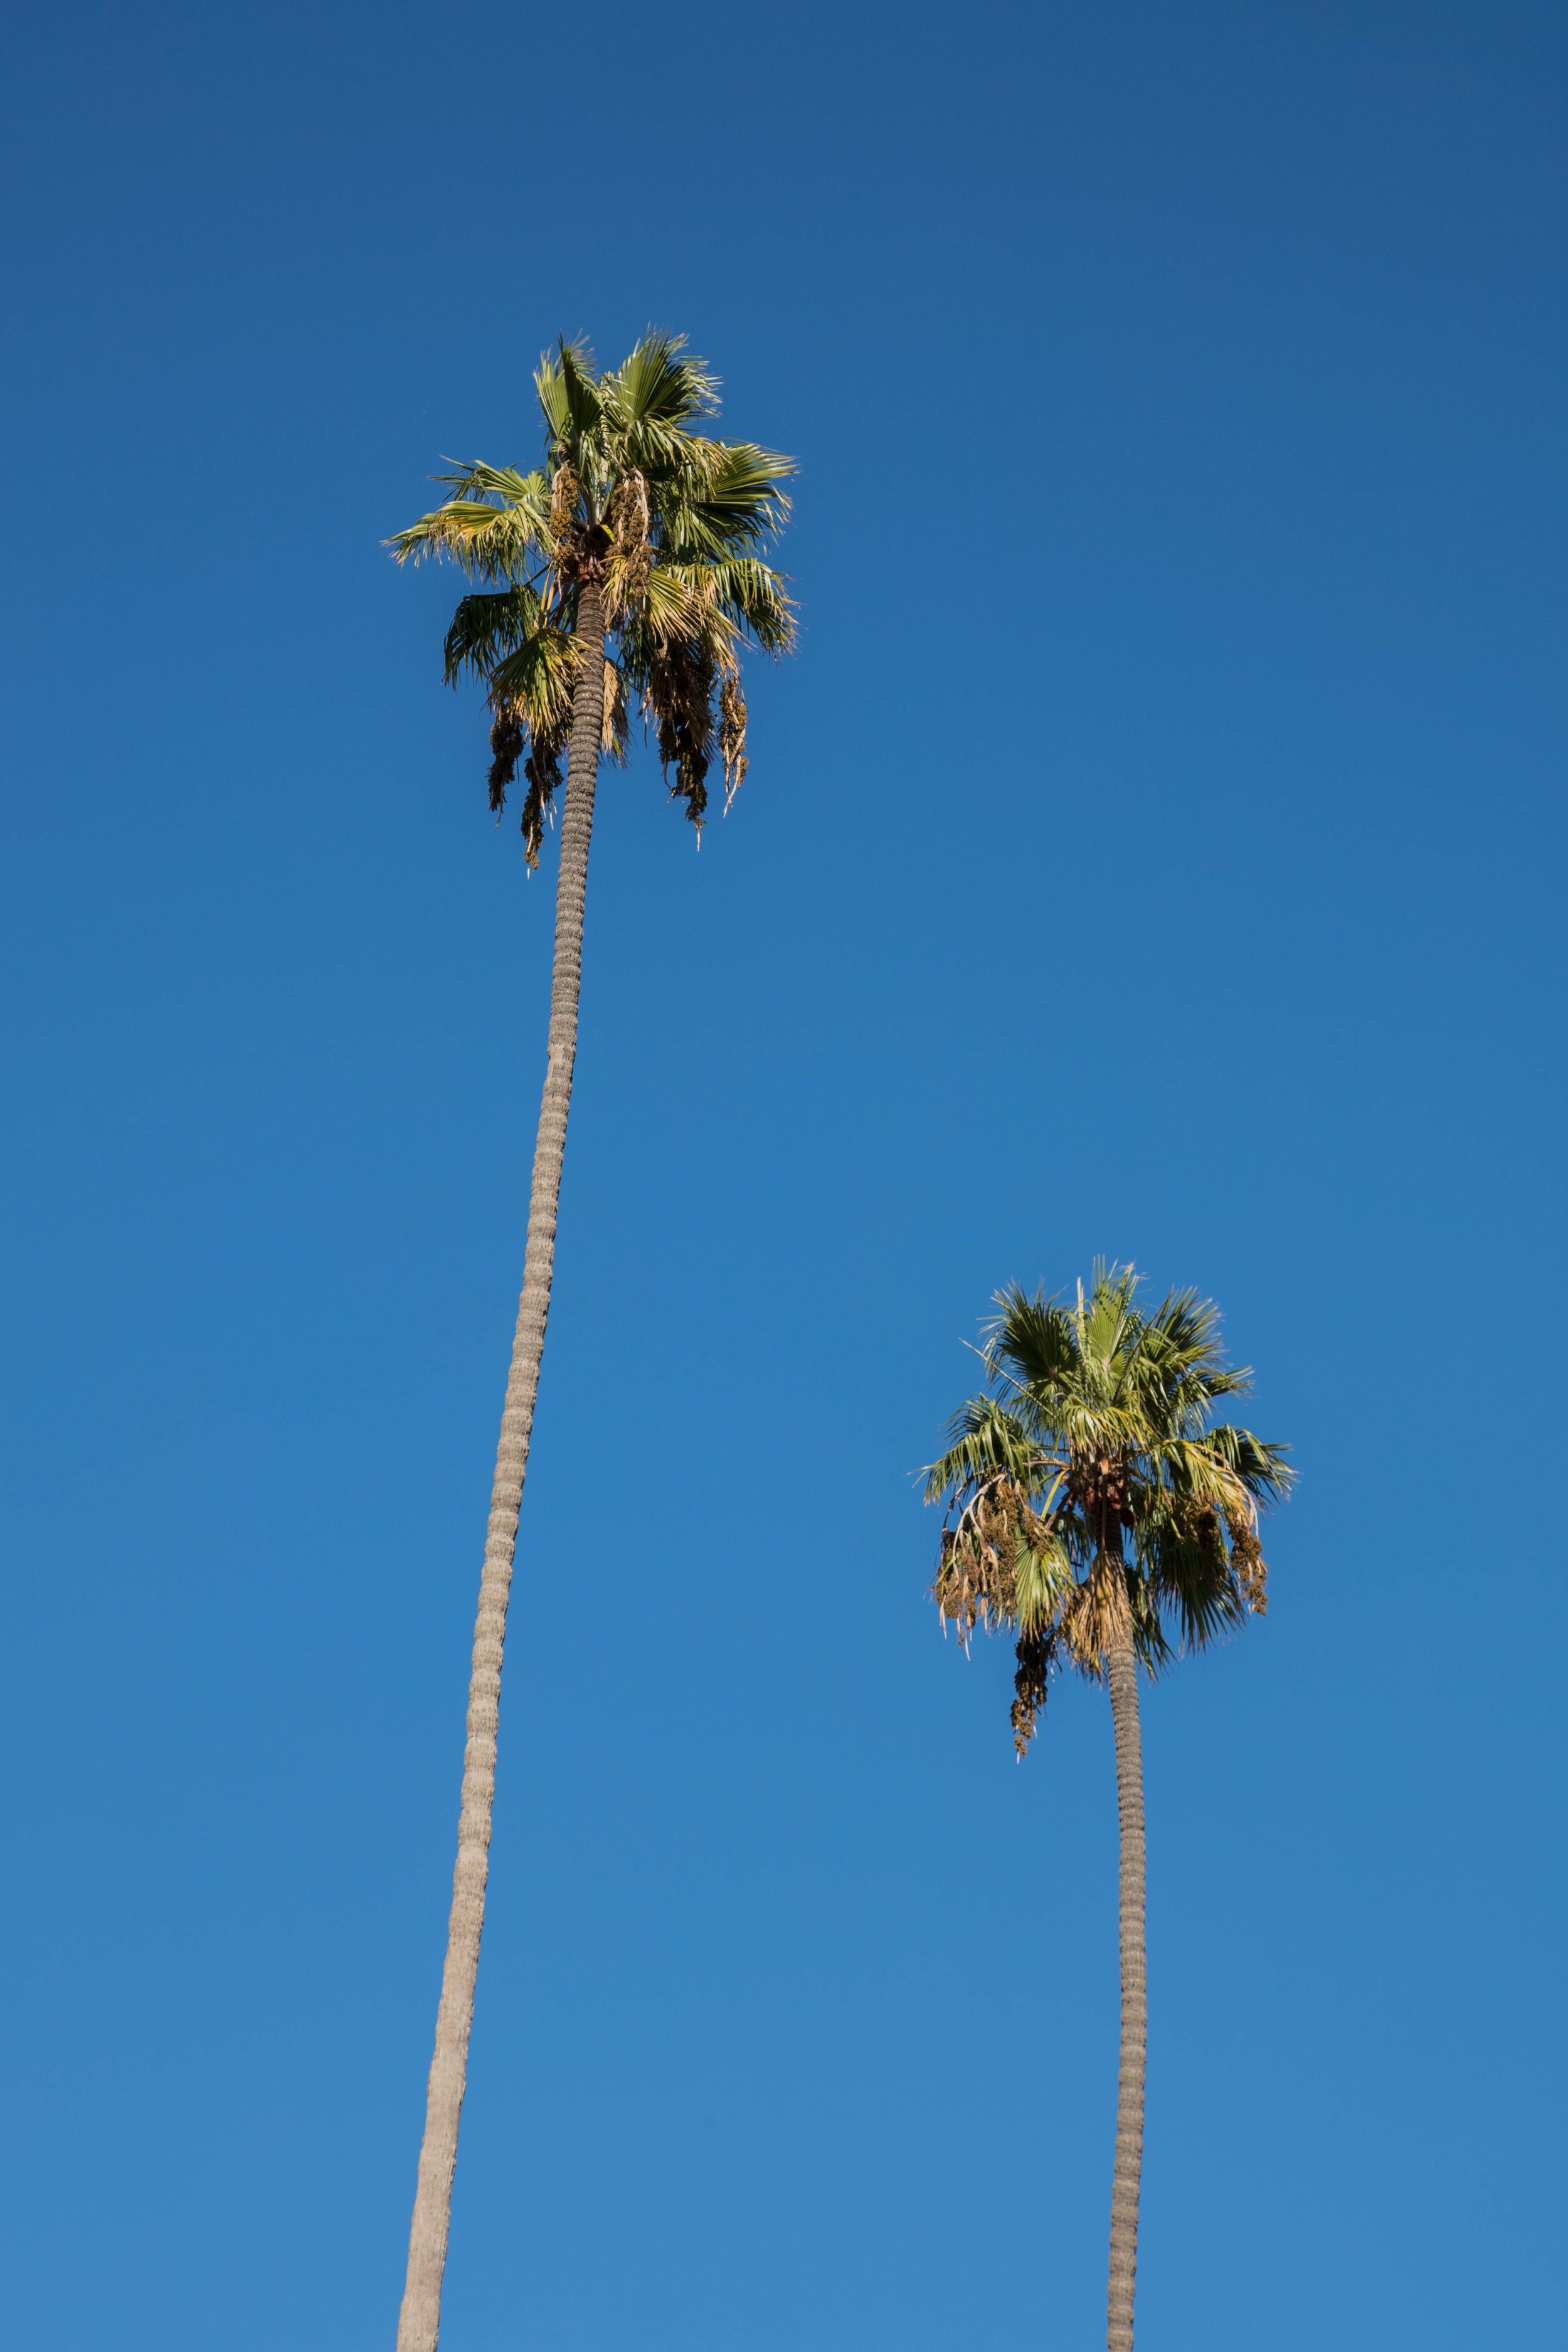 PALM_TREES-5847.jpg